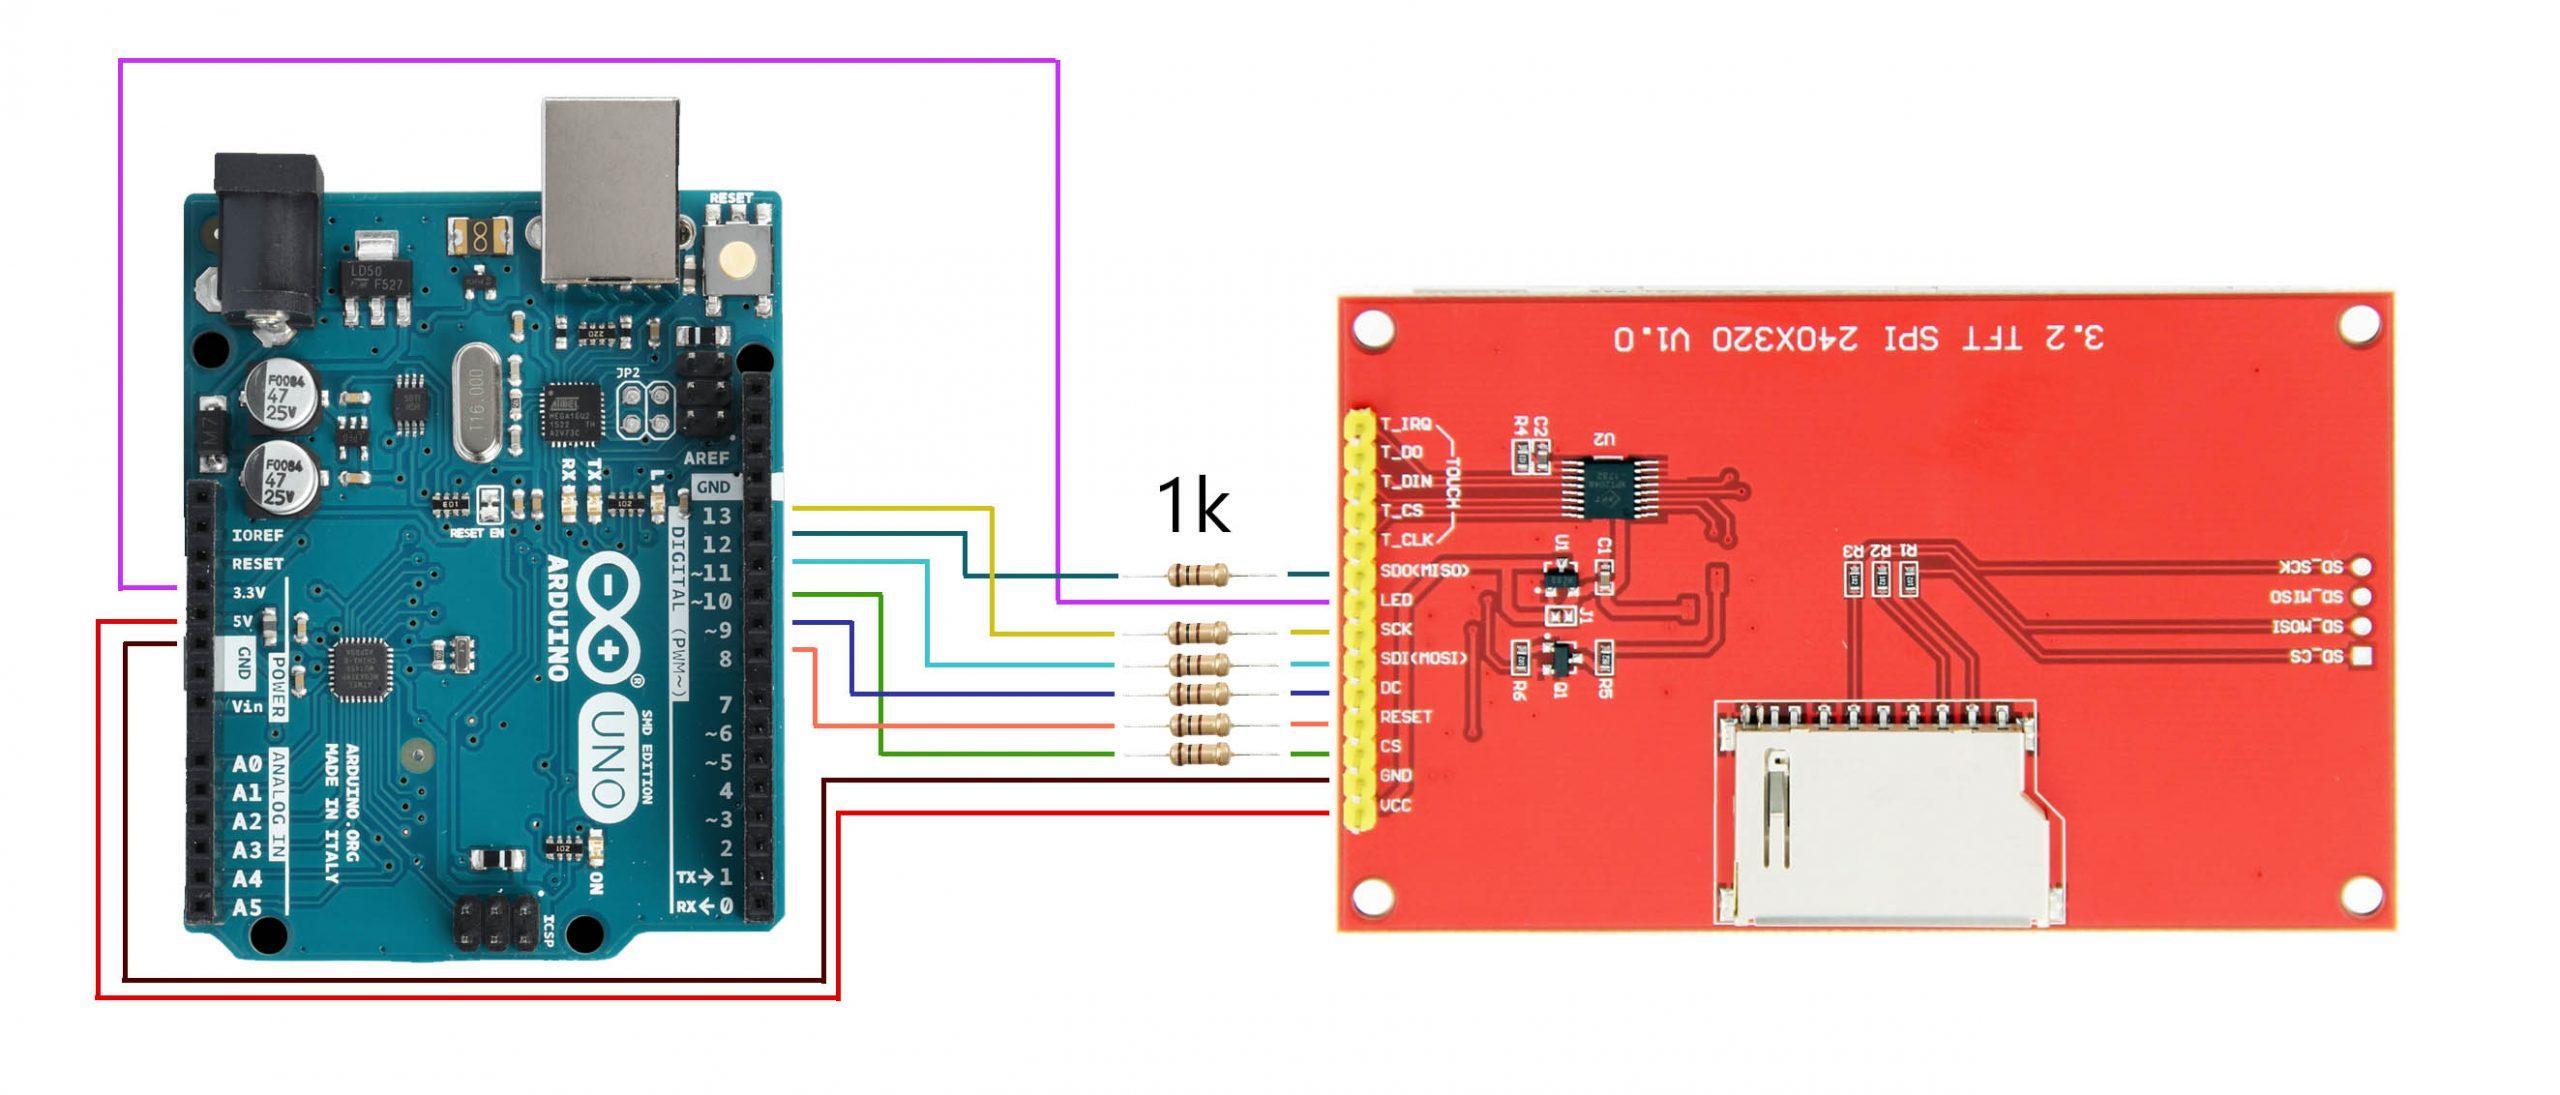 Подключение SPI дисплея ili9341 к Arduino UNO